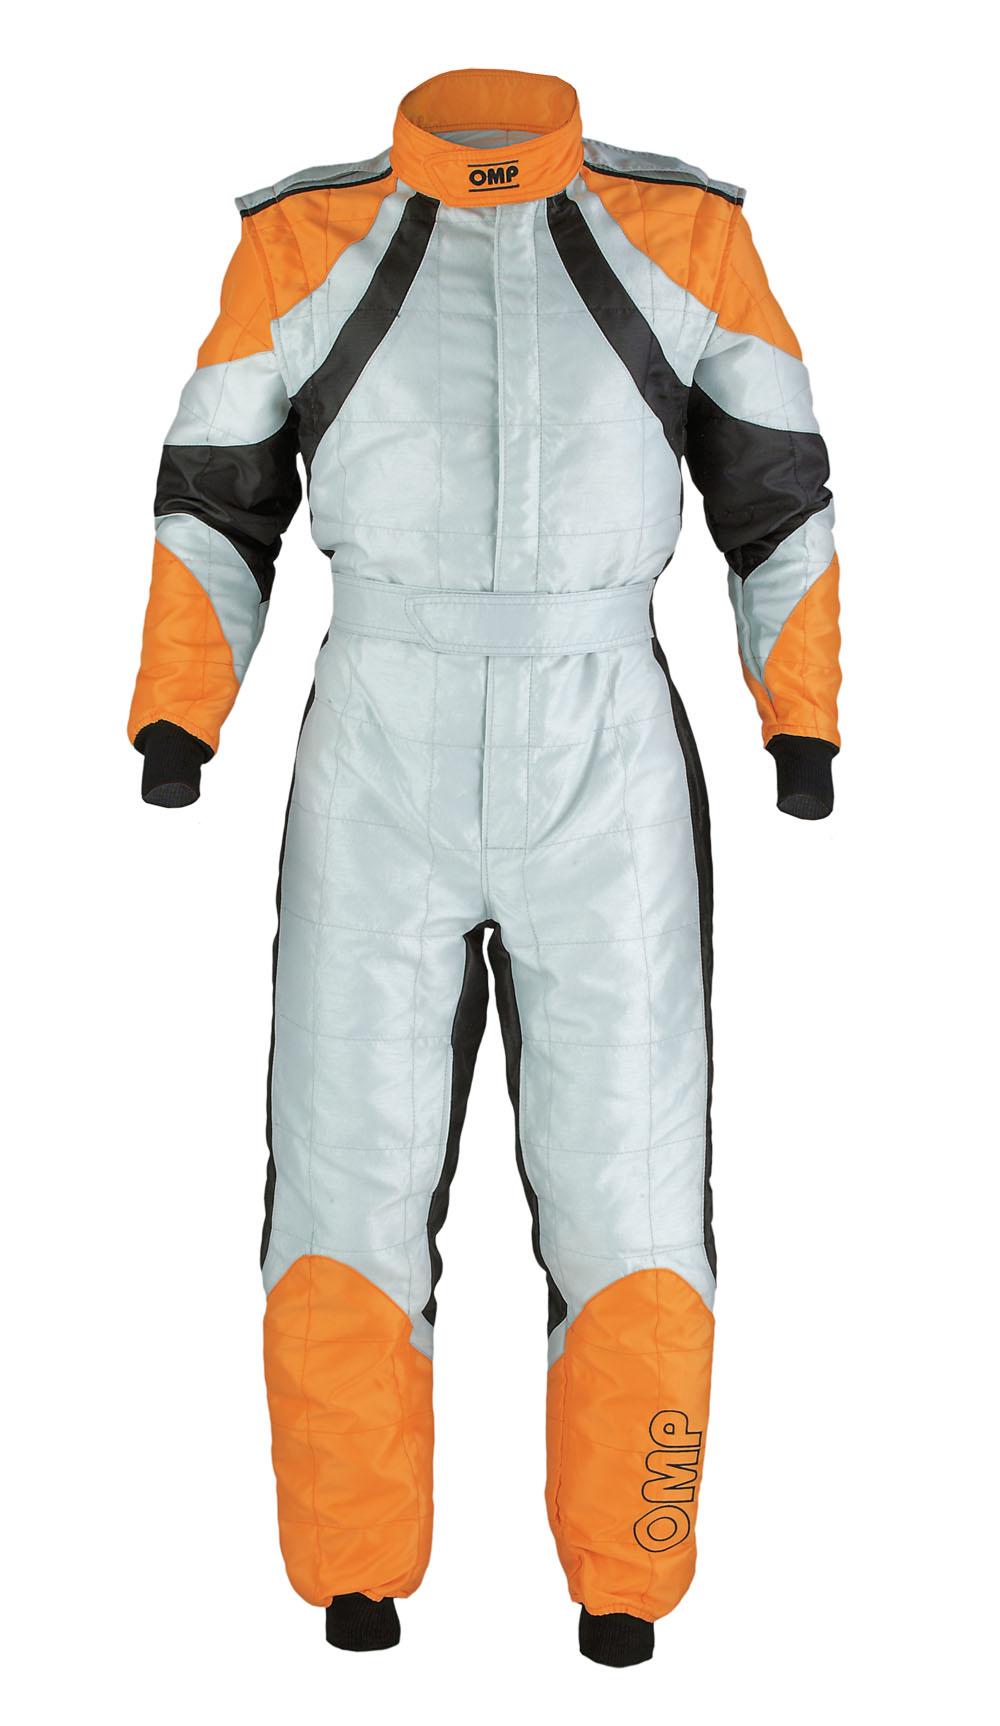 Kk01713 Omp Slash Kart Suit Cik Fia Size 56 Grey Black